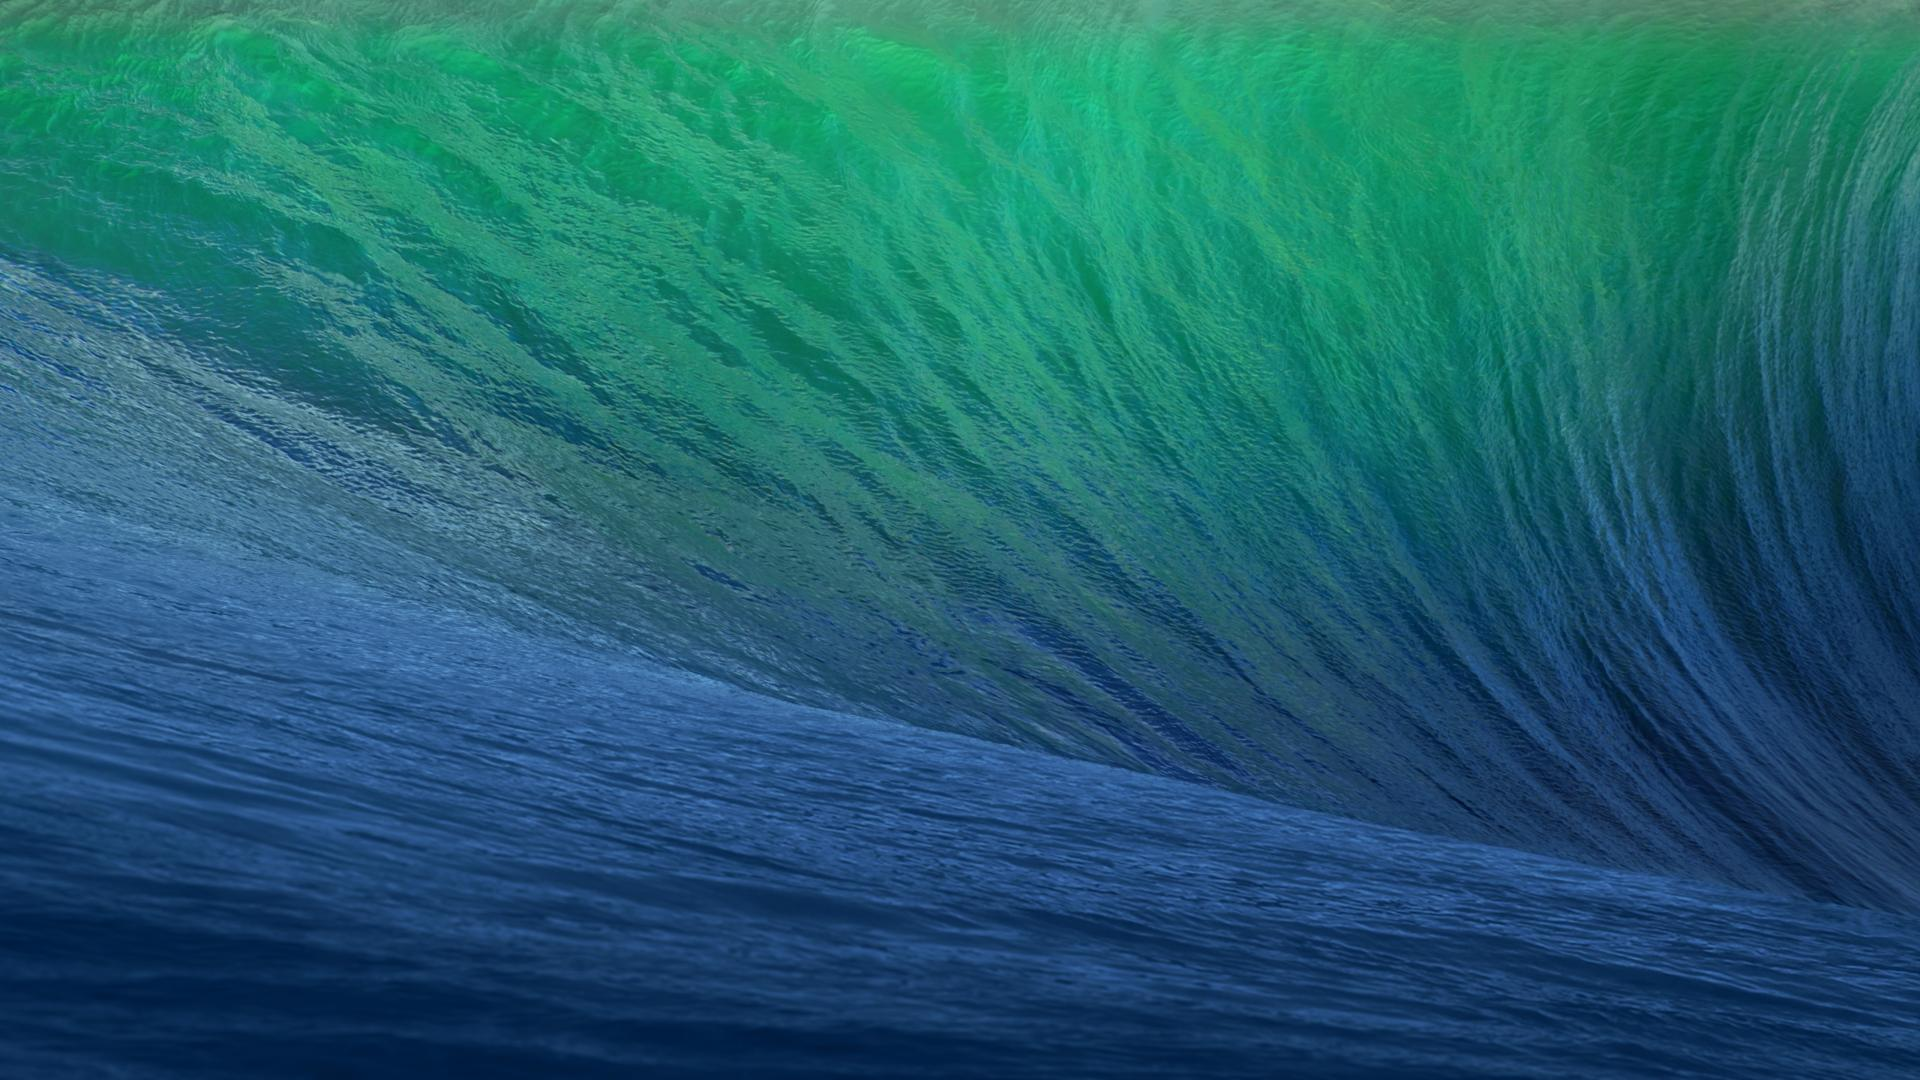 Hero retina macbook pro mavericks os x wallpaper 77137 1920x1080